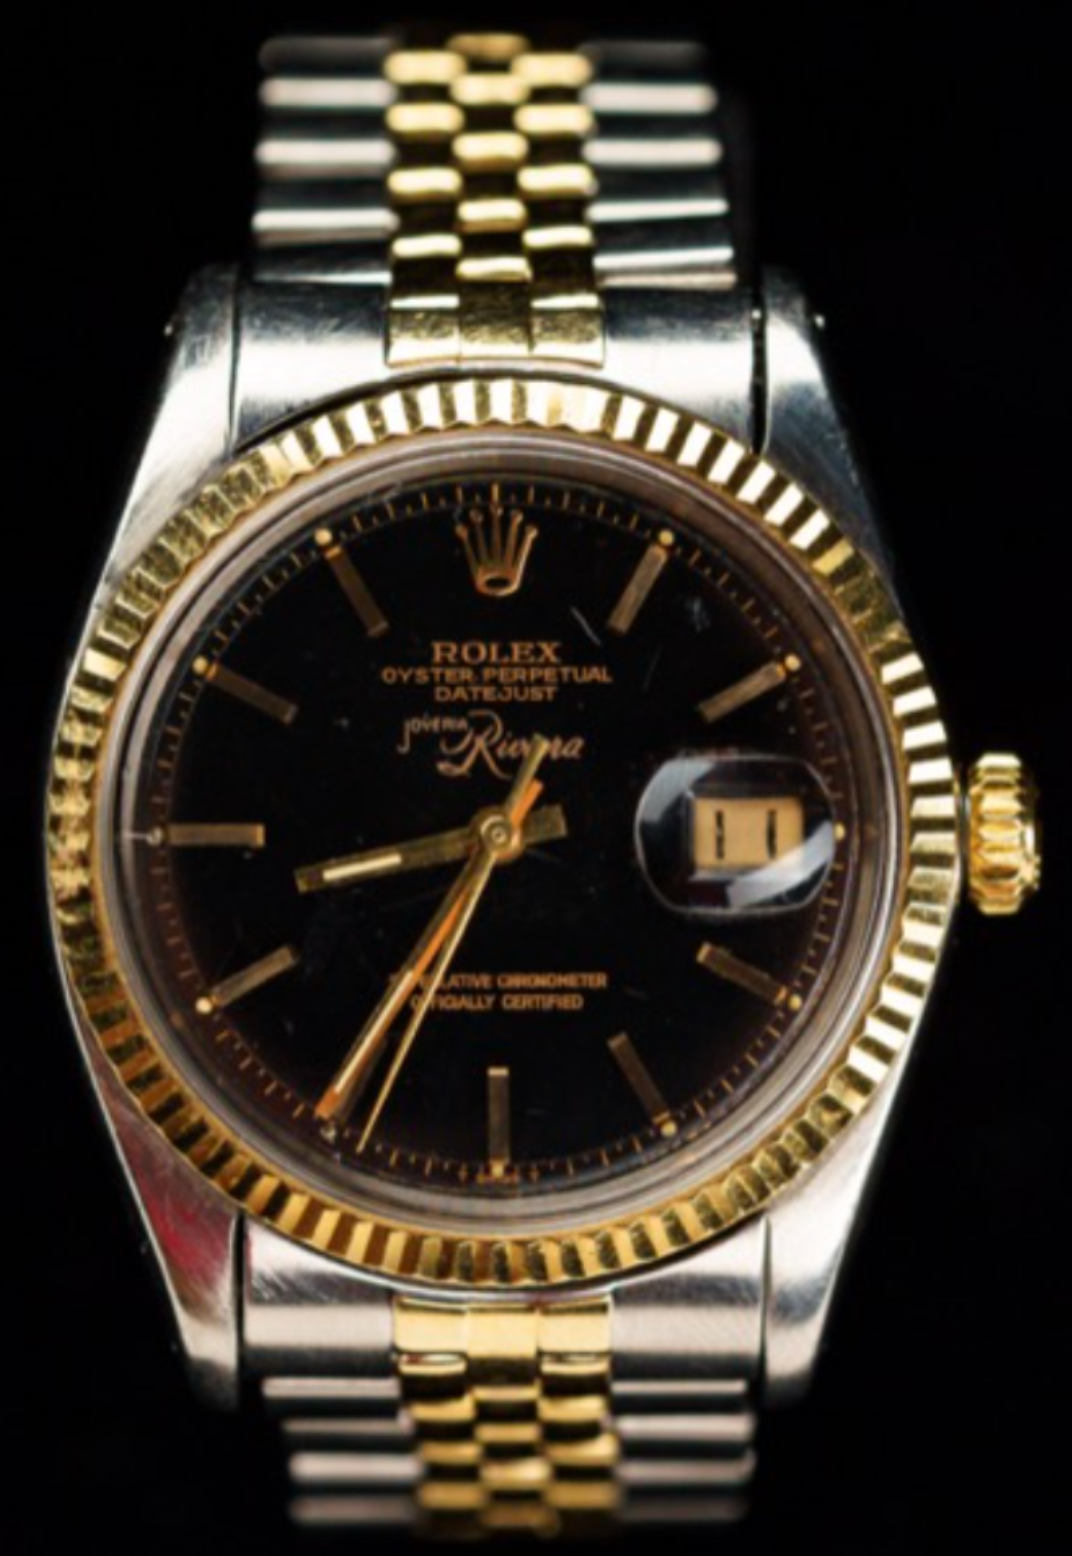 1965 Rolex 1601 Datejust (Joyeria Riviera)